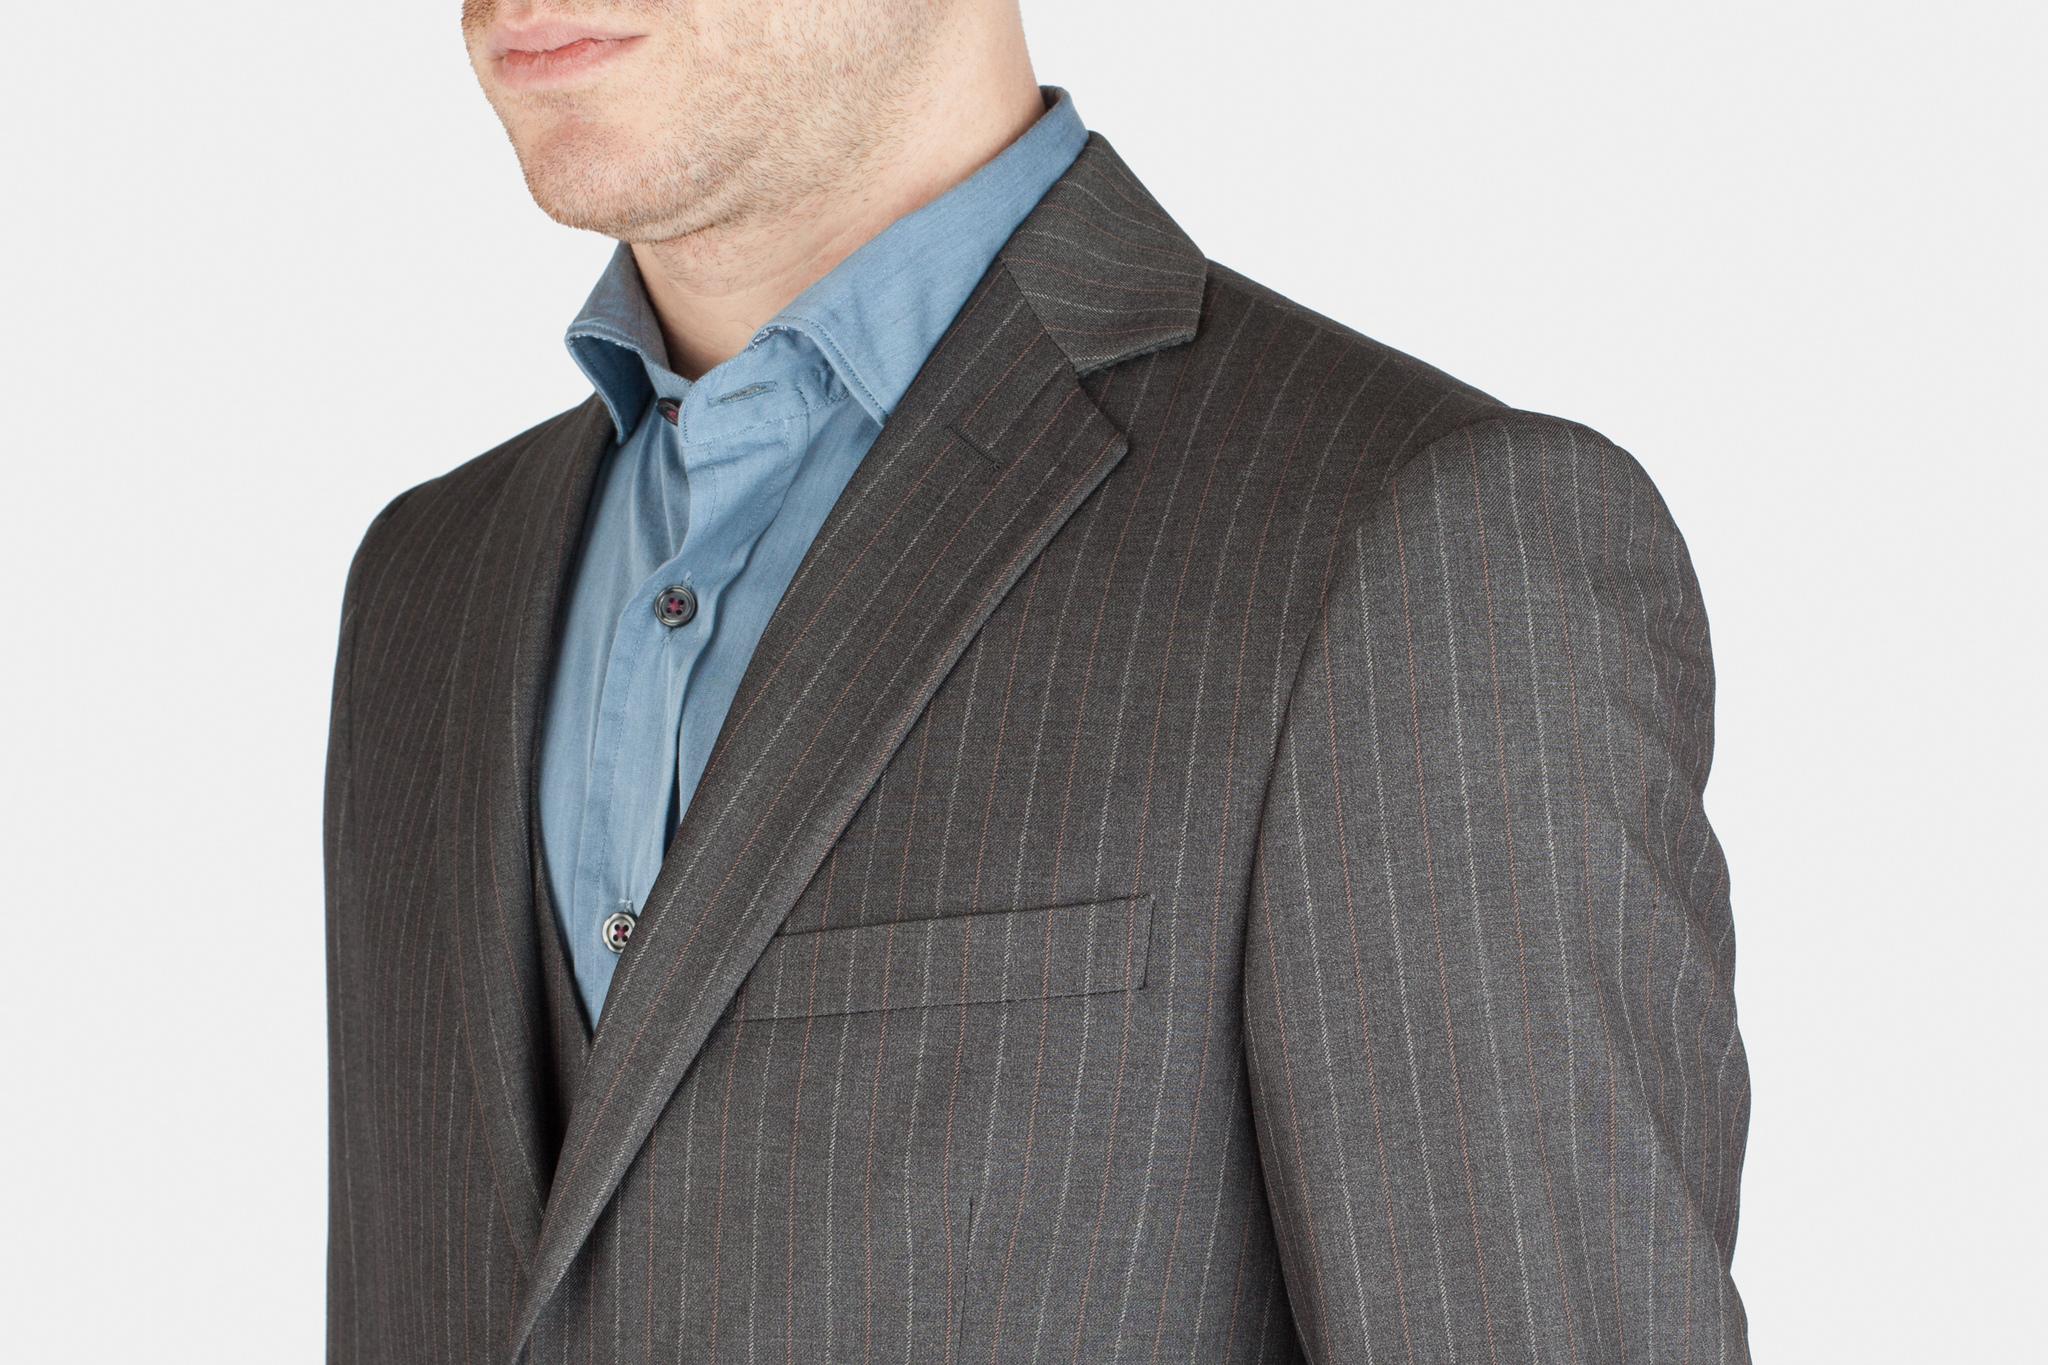 Серый шерстяной костюм-тройка, нагрудный карман